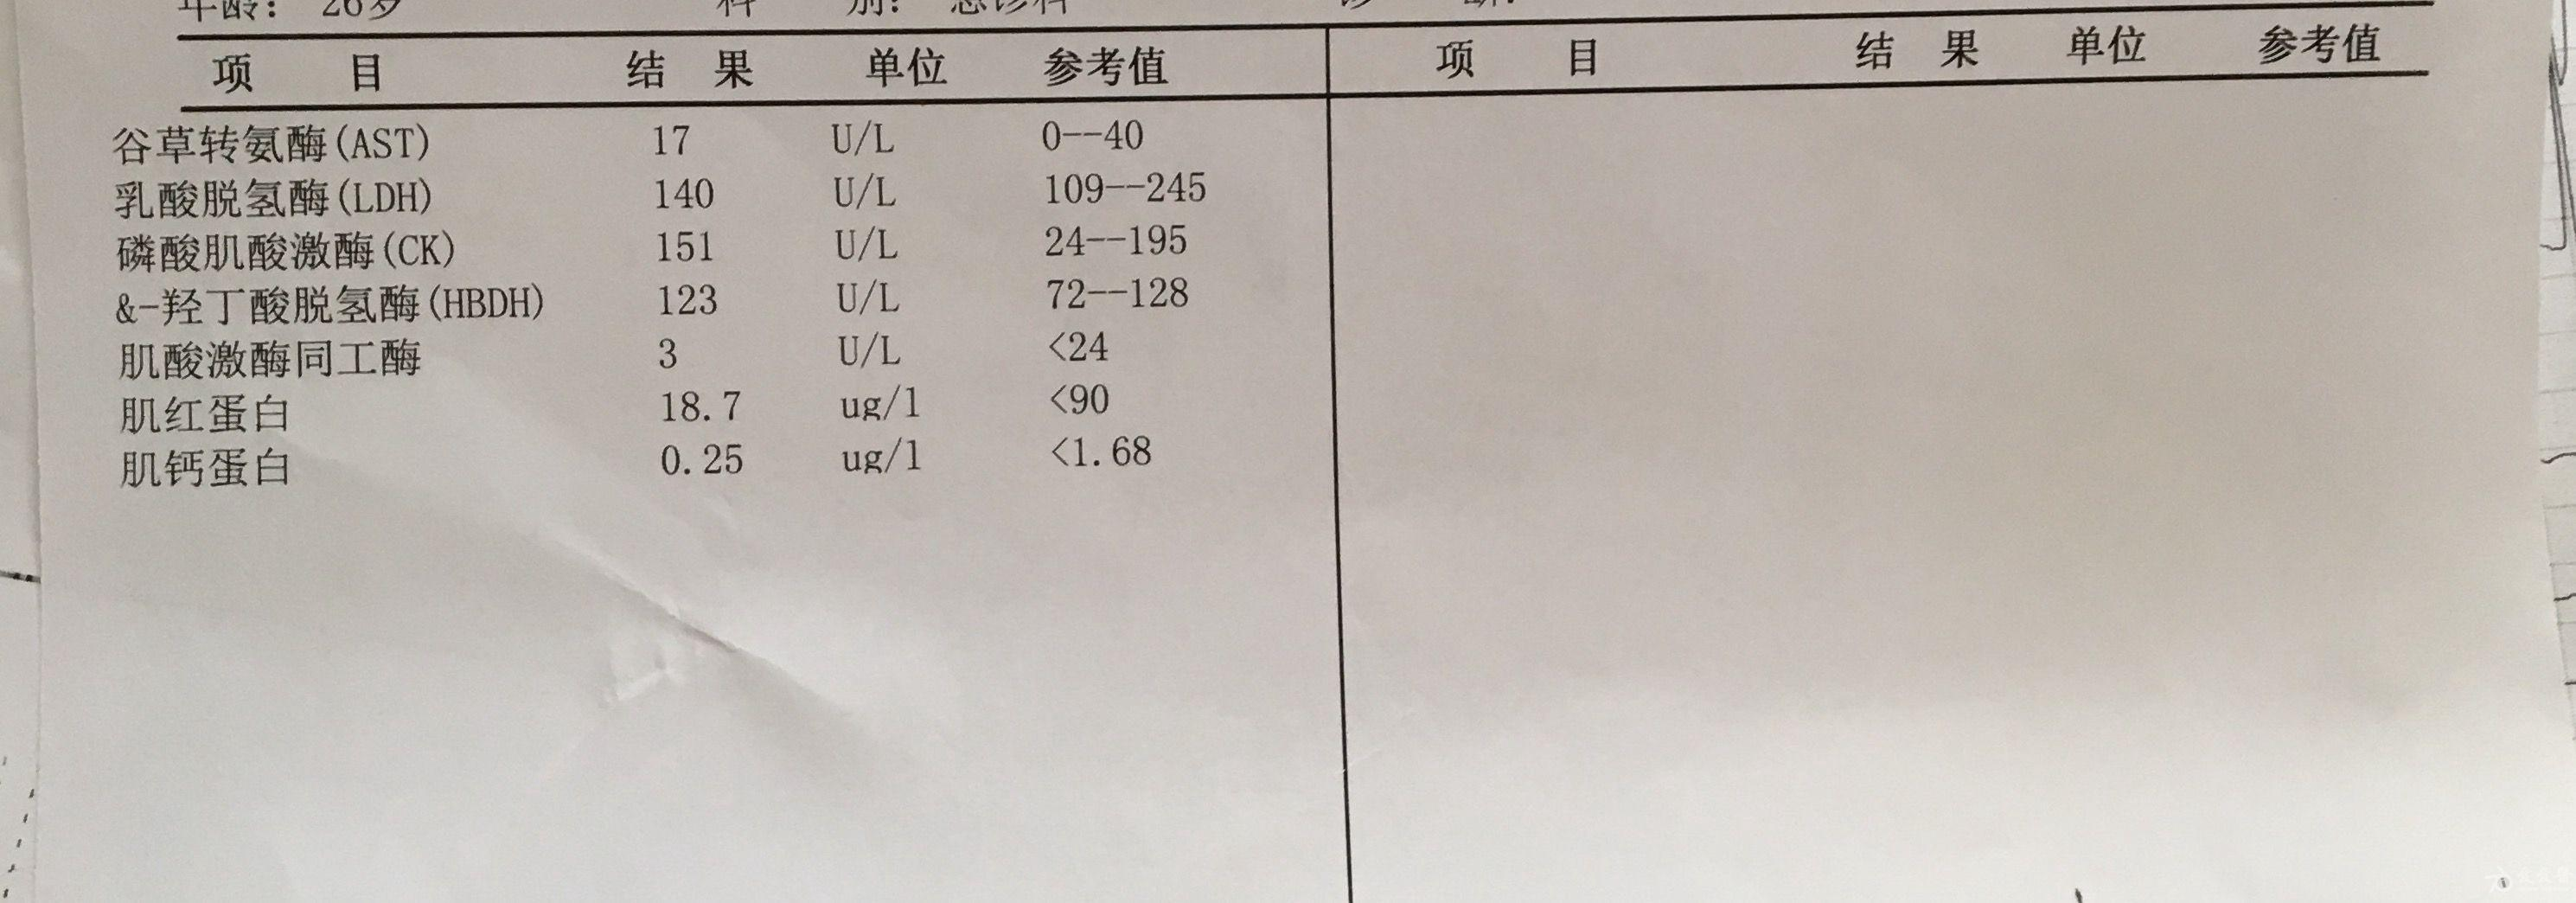 IMG_4256.JPG